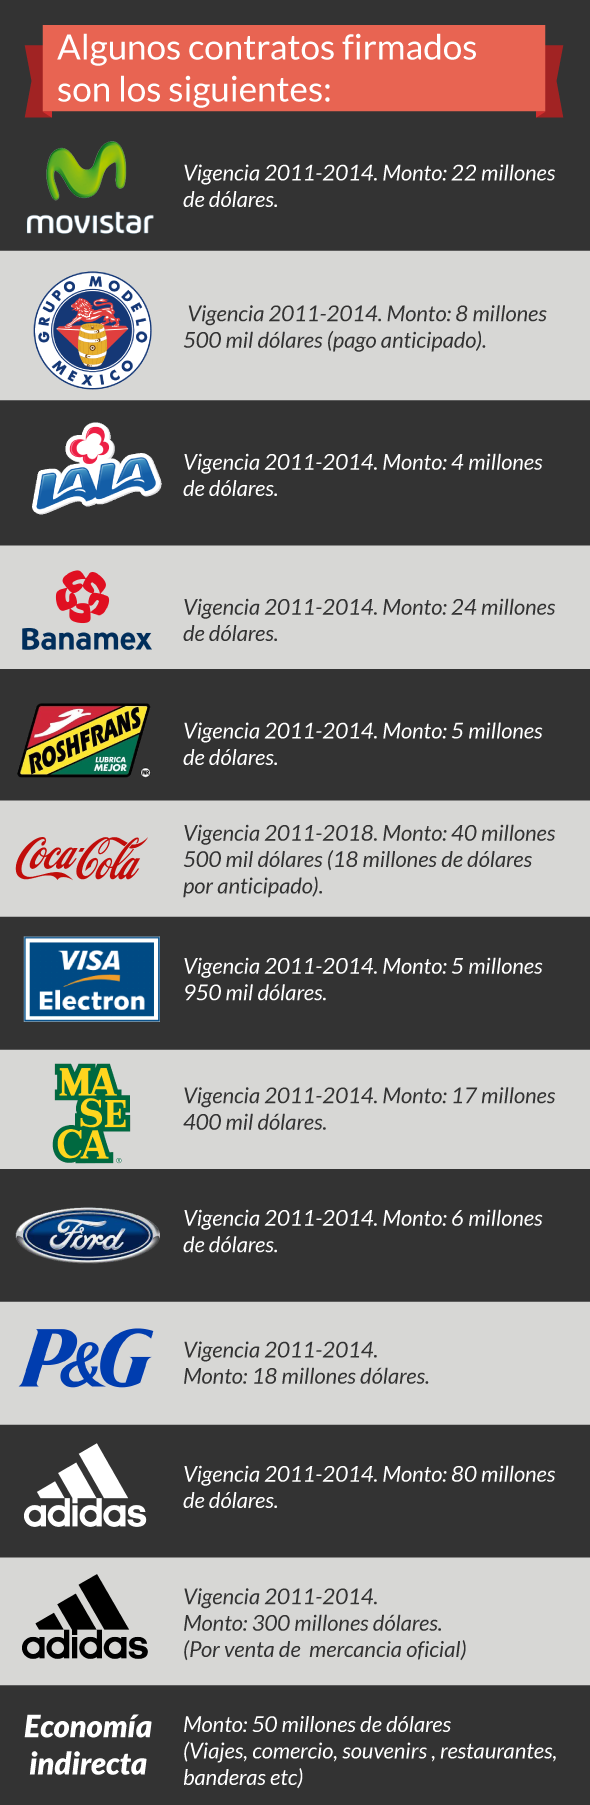 marcas21